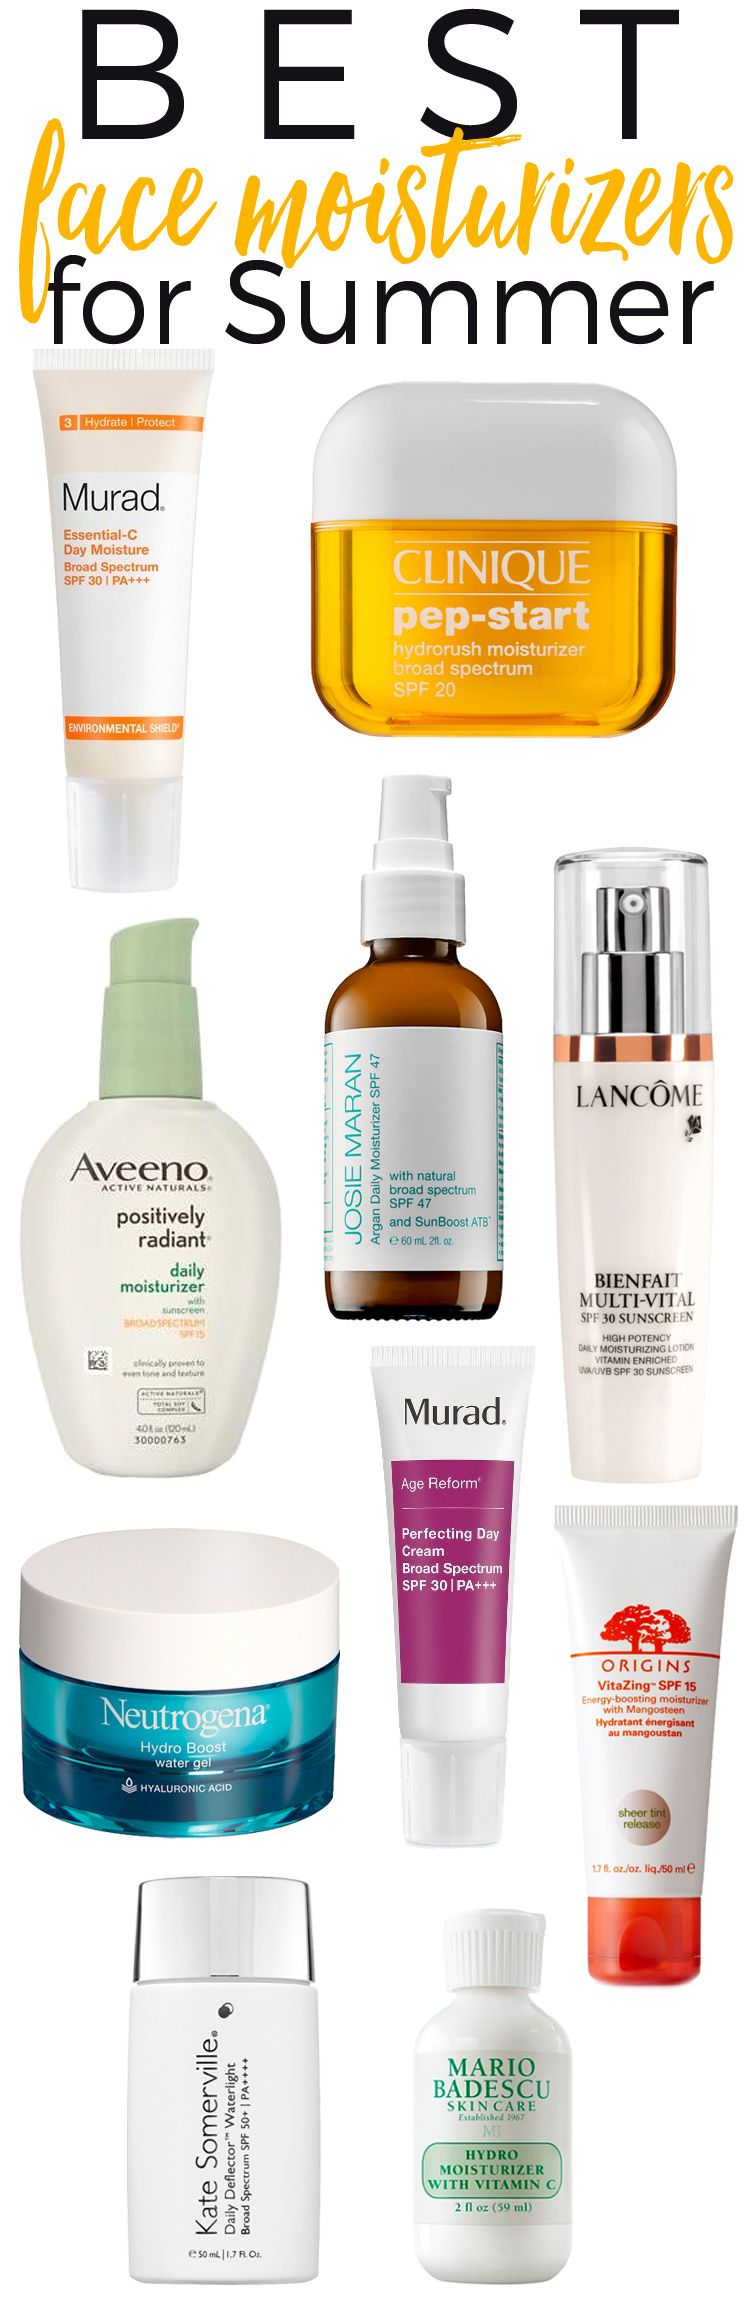 10 best skincare tips for summer time